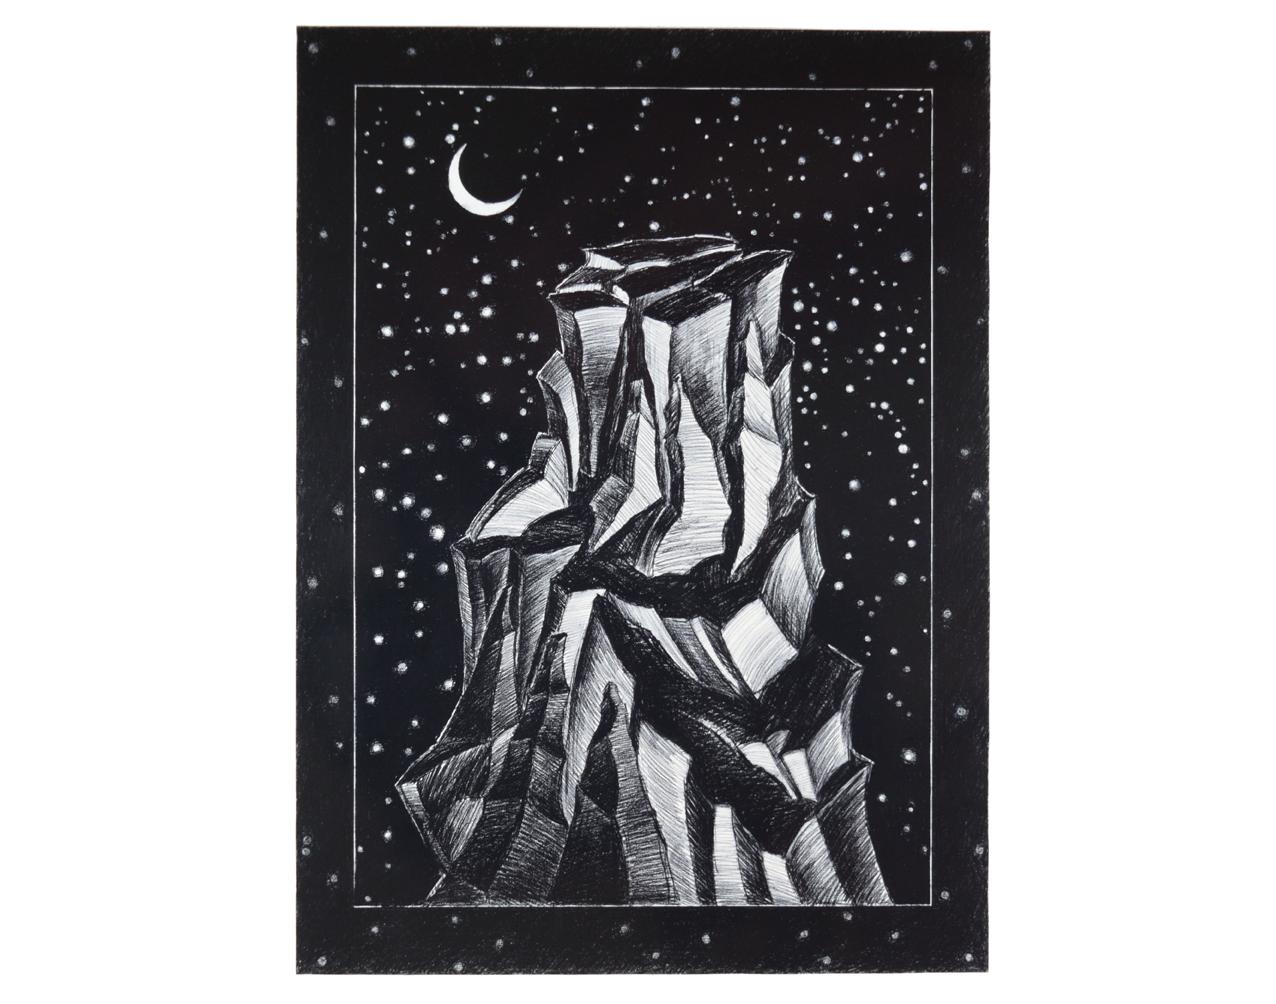 """Sternenhimmel"" 1981, Kohle auf Papier, 157 x 115 cm - Foto Hadler/Stuhr"